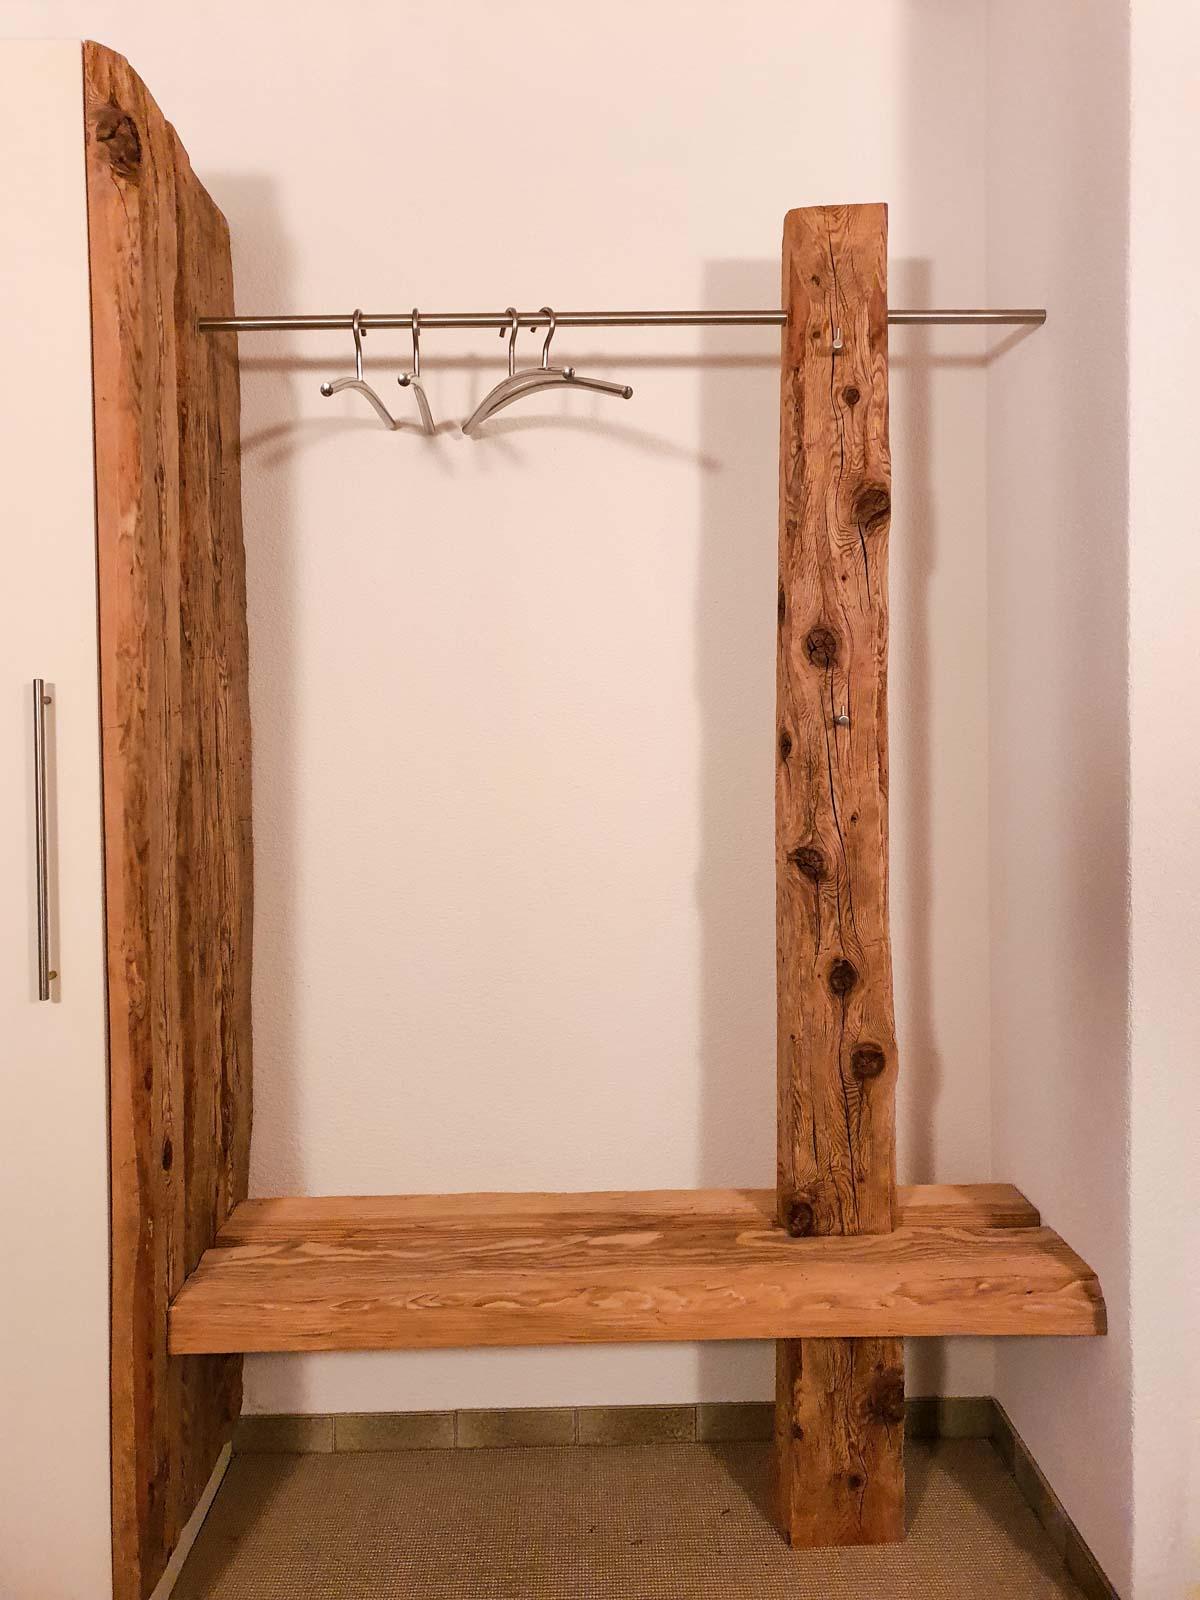 Wooddesign_Garderobe_Gästegarderobe_rustikal_Altholz_Sitzbank_Edelstahl (3)